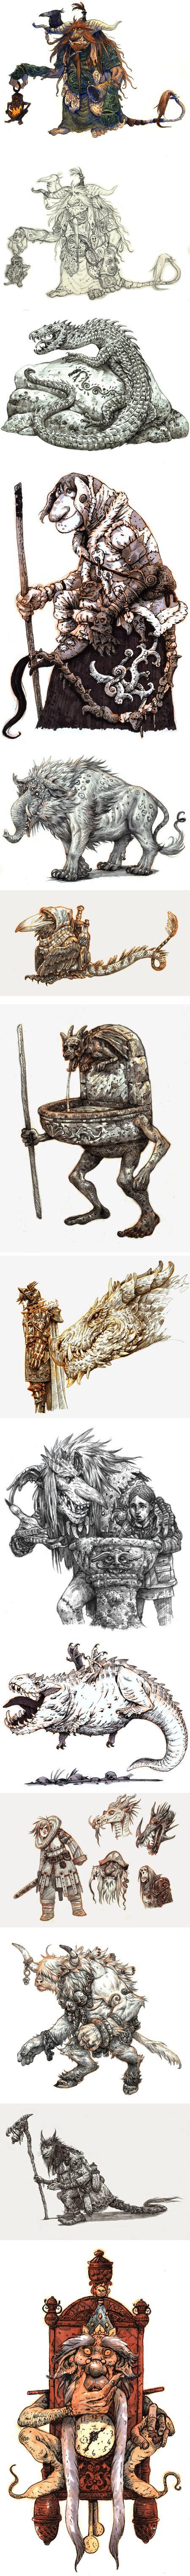 Eoghan Kerrigan, fantasy illustration